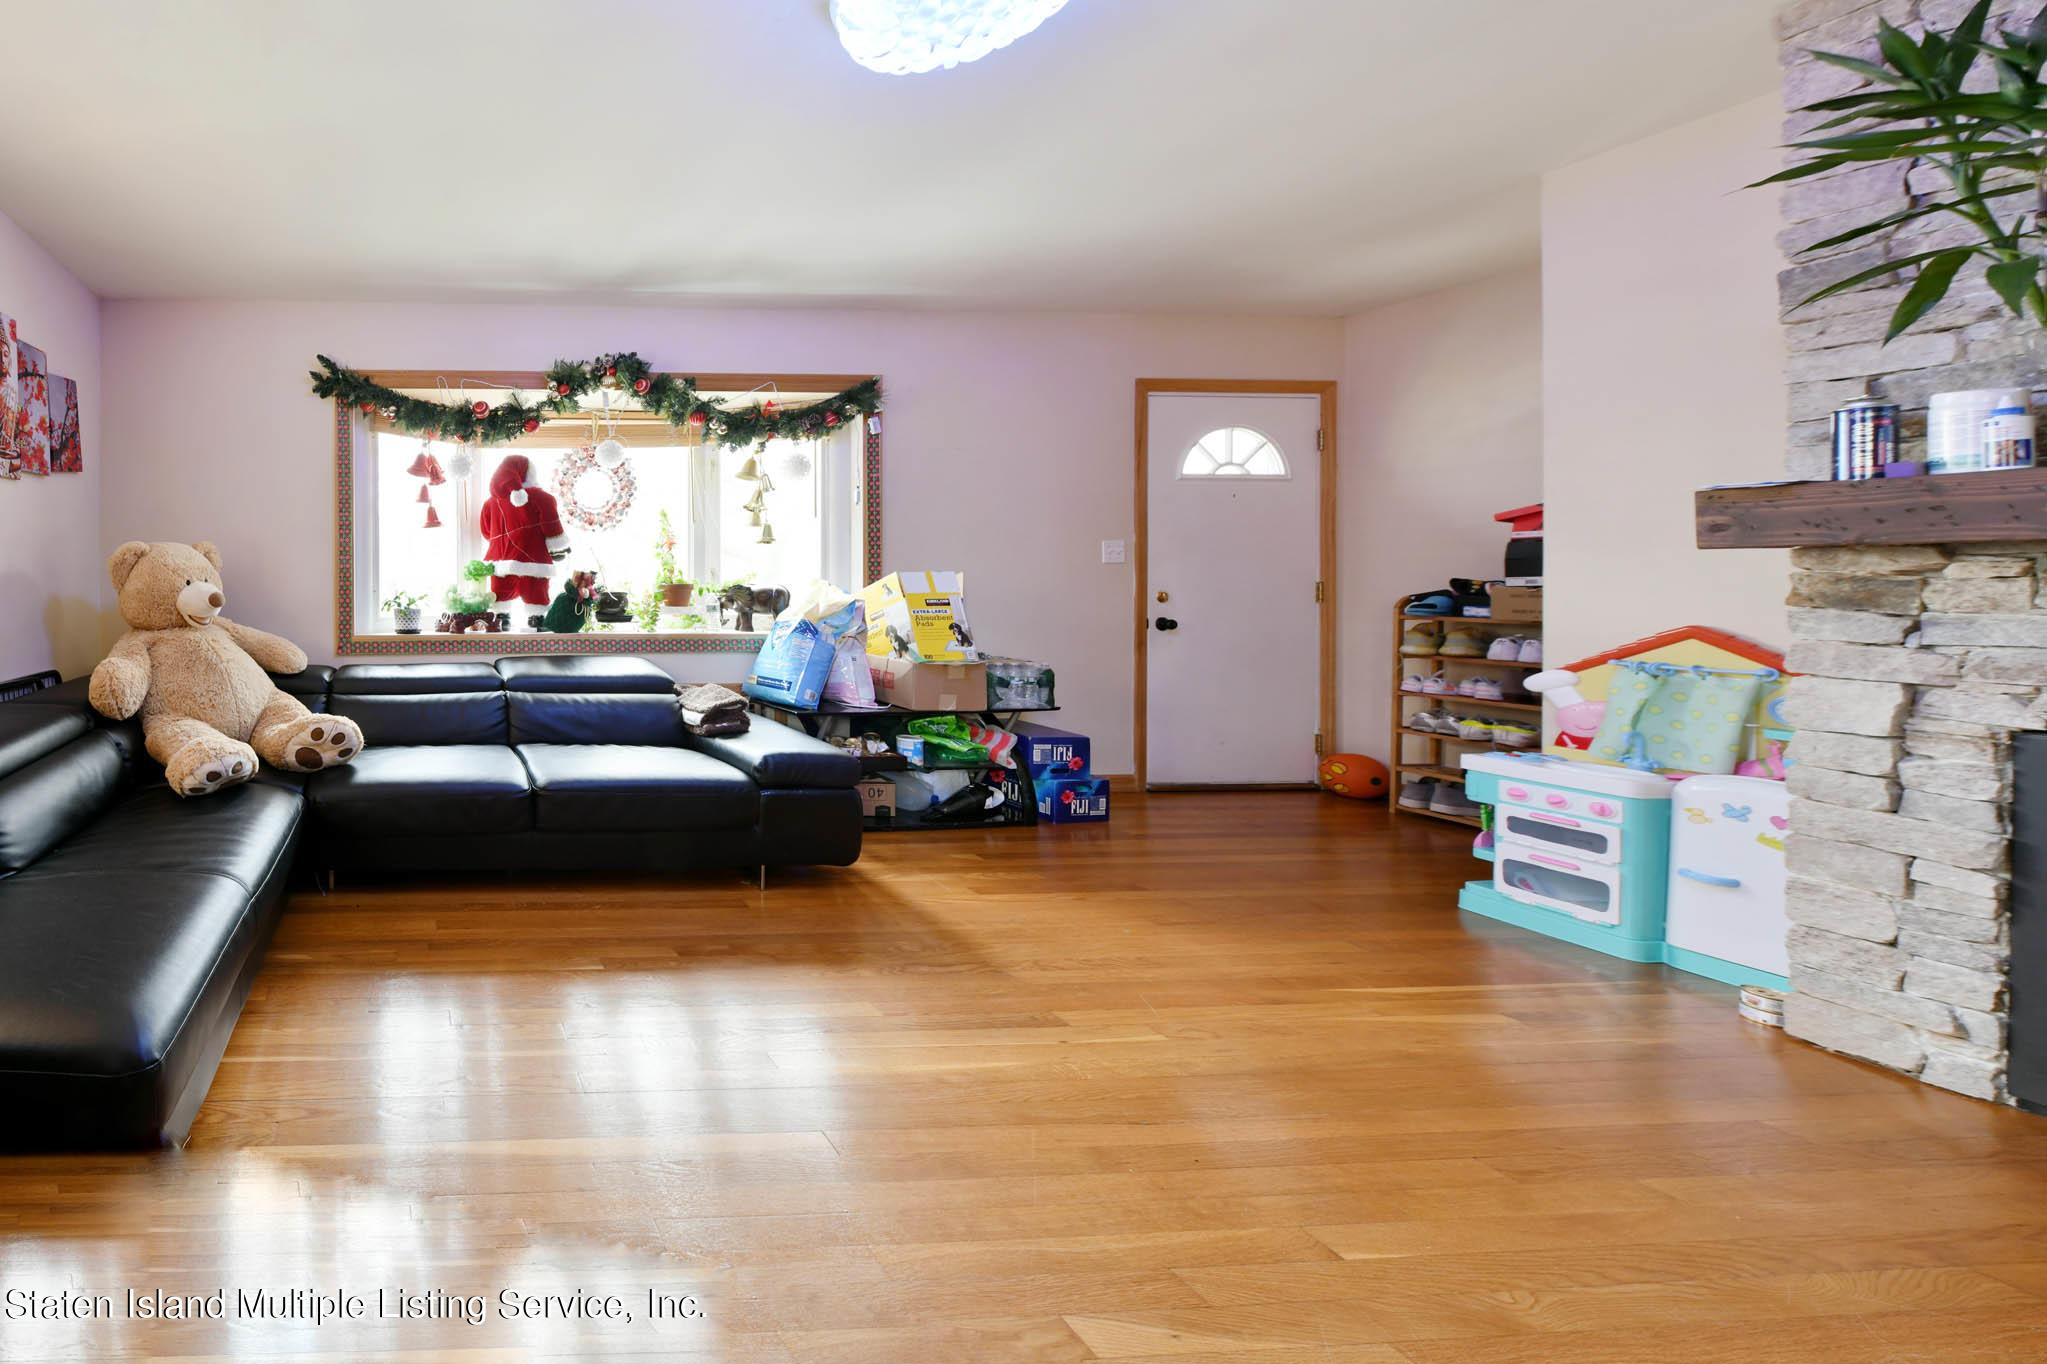 Single Family - Detached 110 Ravenhurst Avenue  Staten Island, NY 10310, MLS-1143189-2